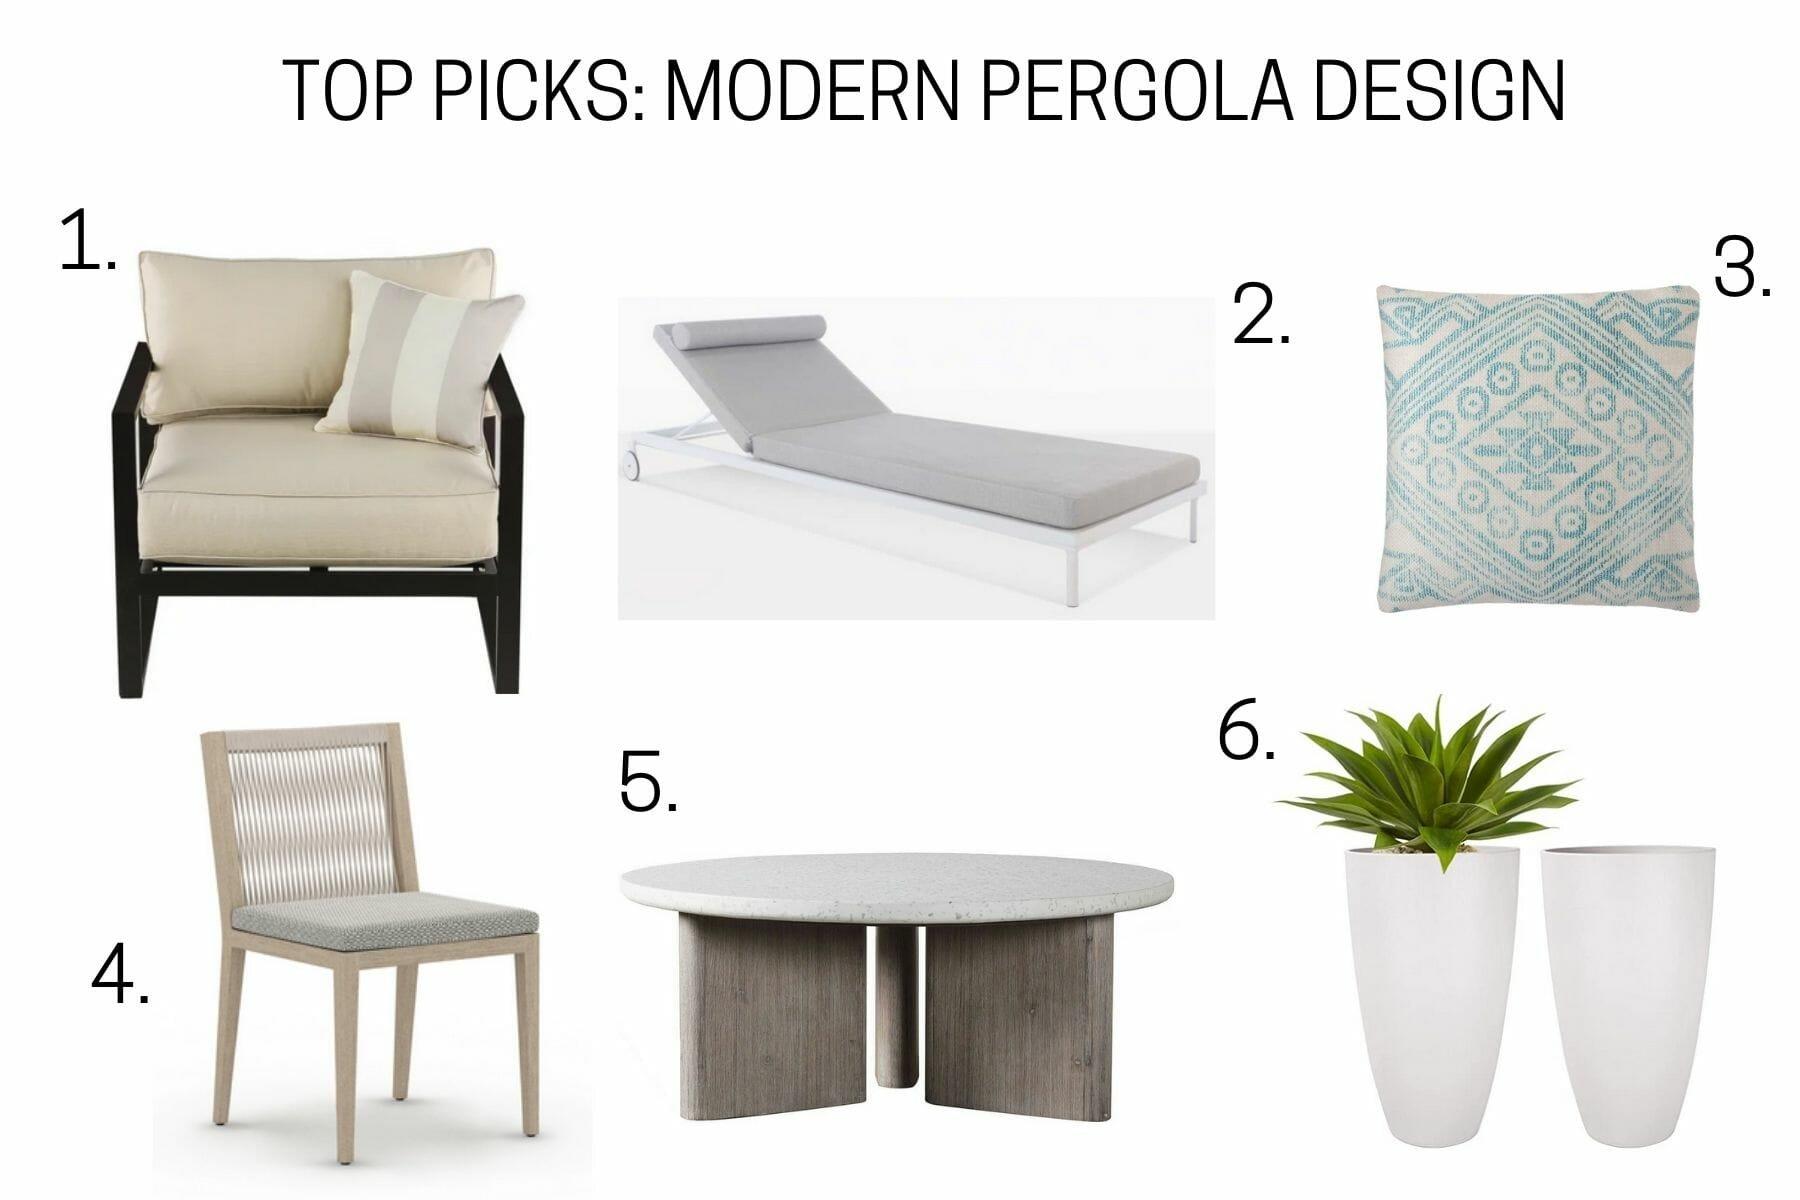 Top picks for poolside patio decor